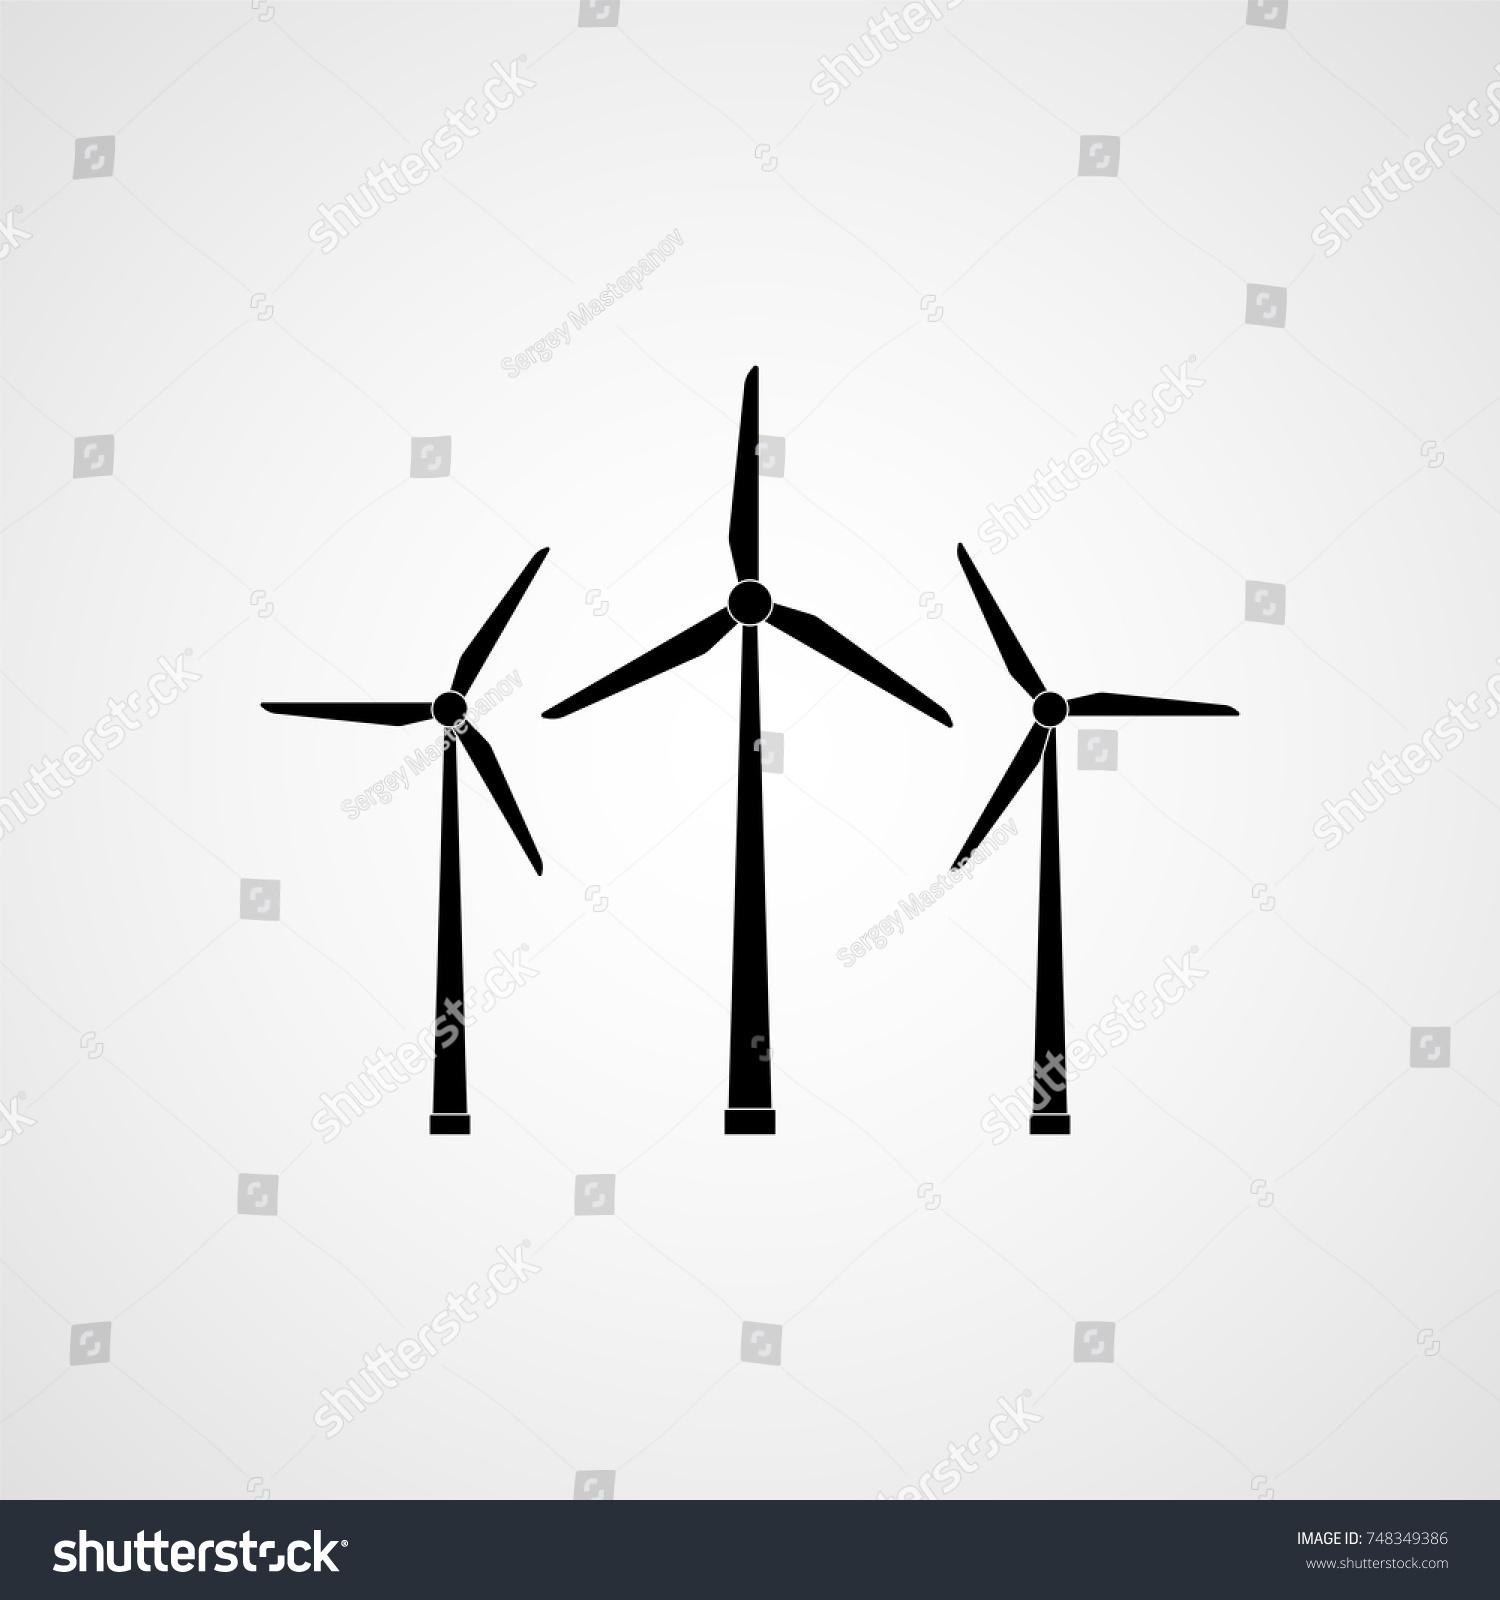 Eco Energy Wind Turbines Vector Illustration Stock Royalty Power Turbine Diagram